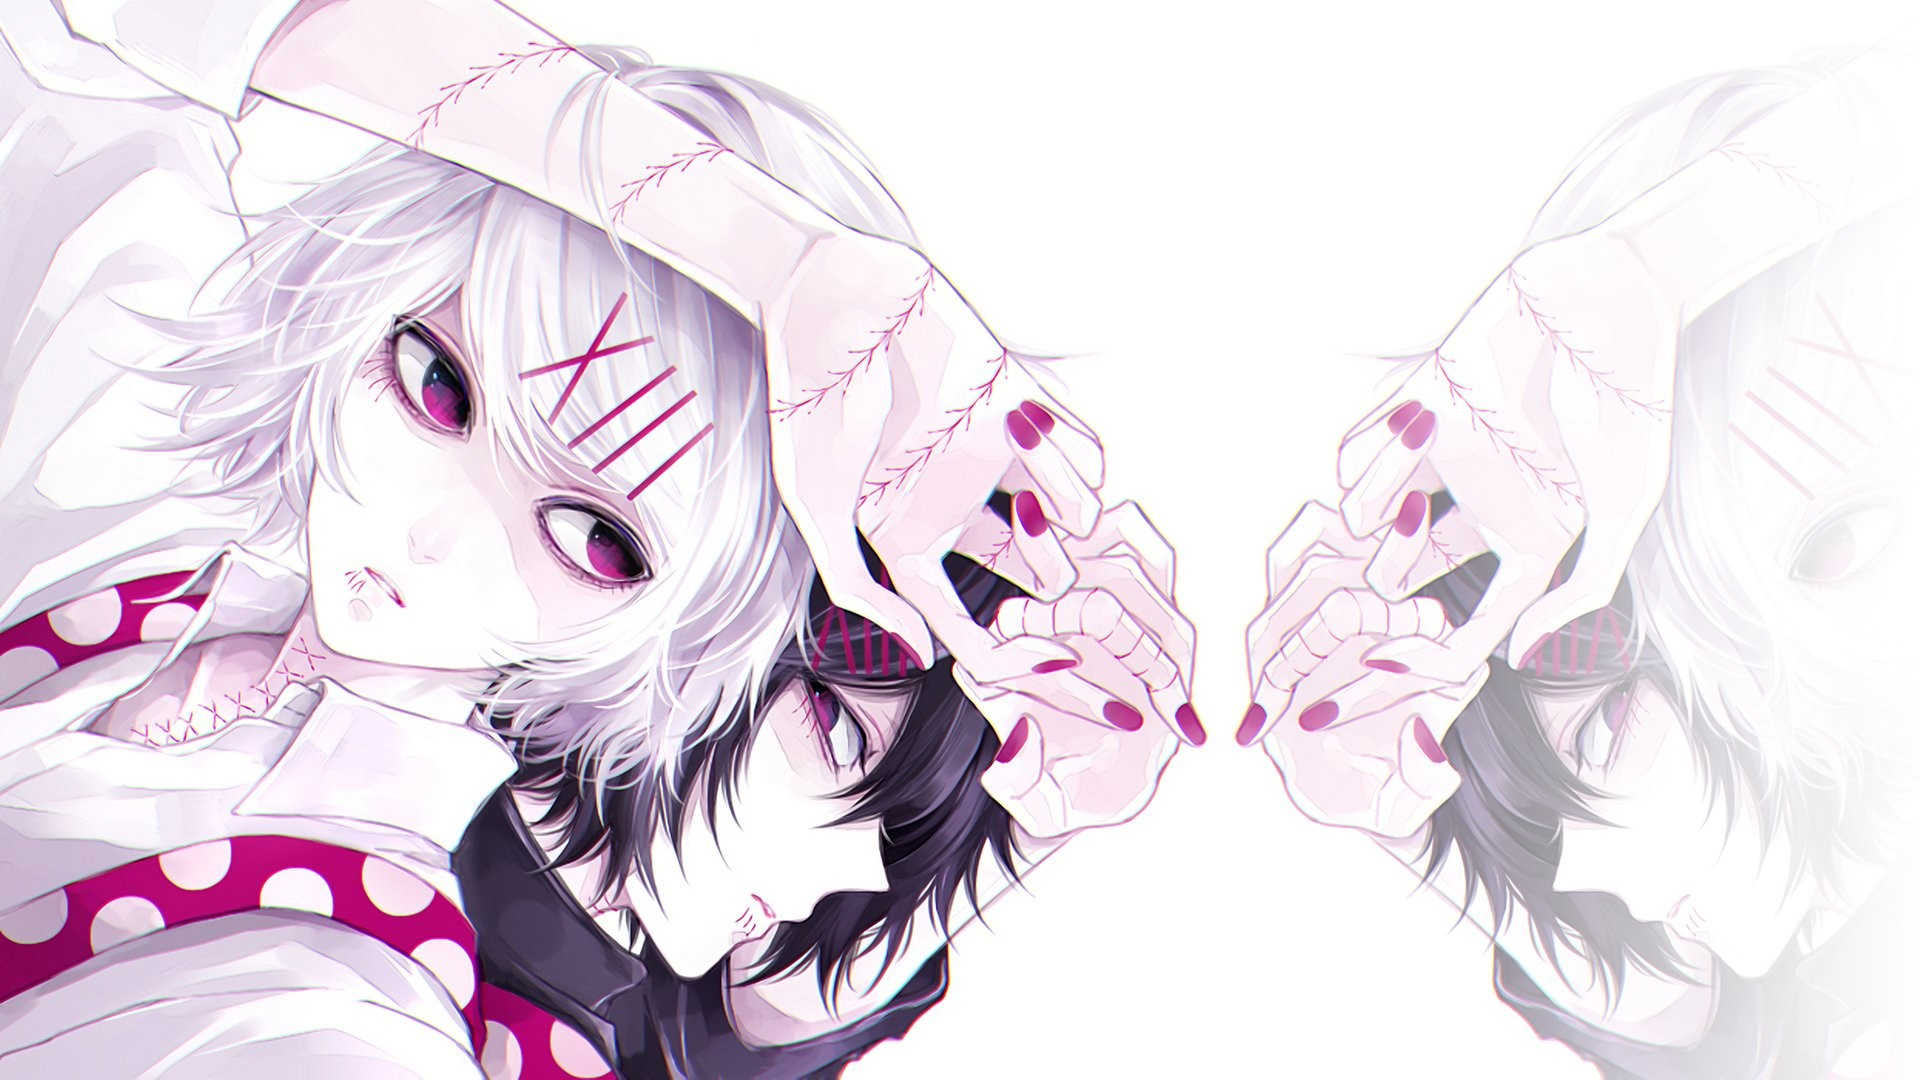 Papel de Parede HD | Plano de Fundo ID:772213. Anime Tokyo Ghoul